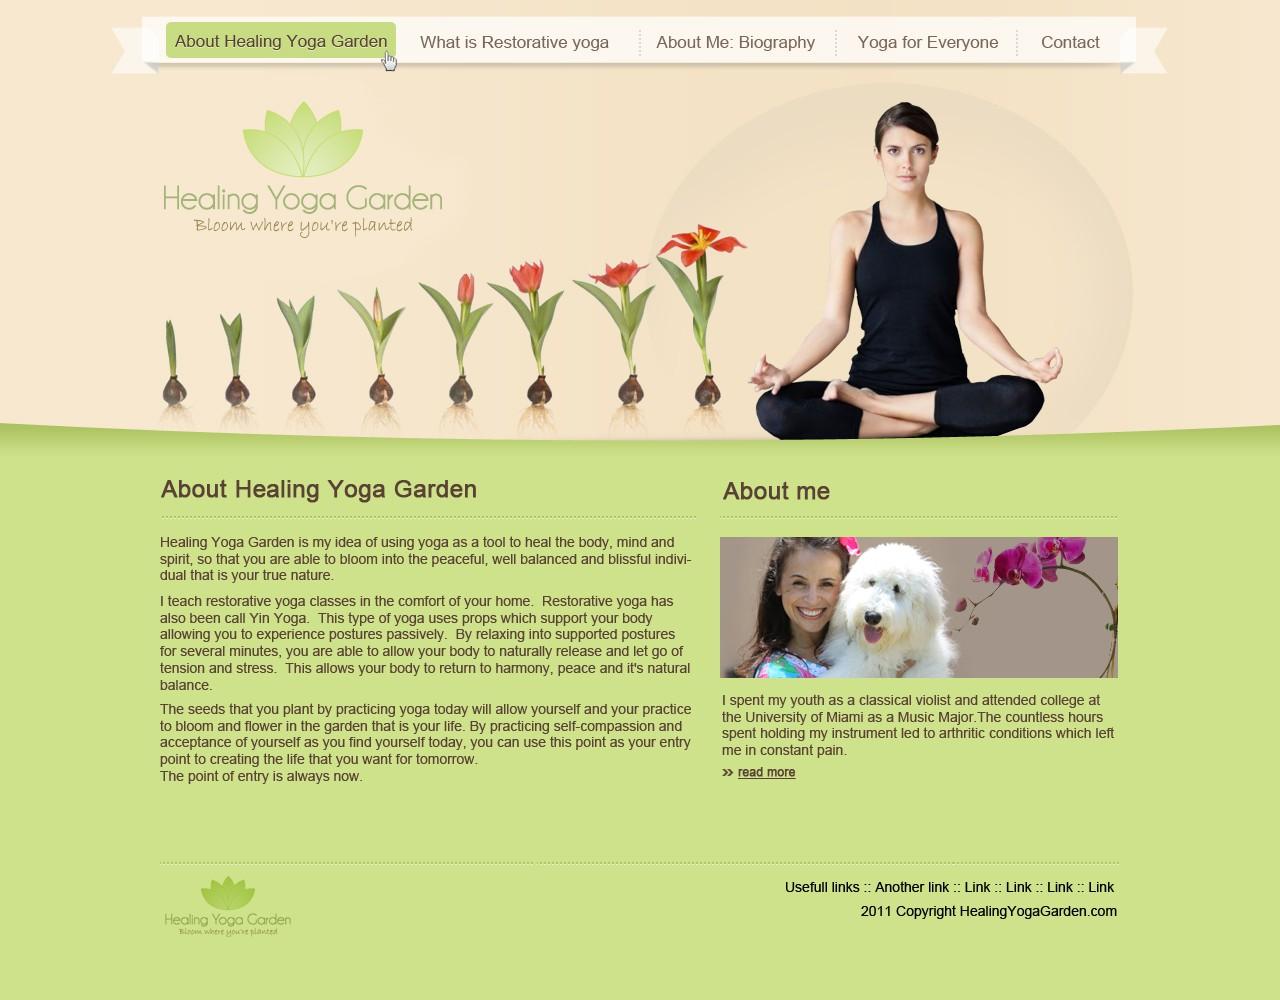 website design for Healing Yoga Garden